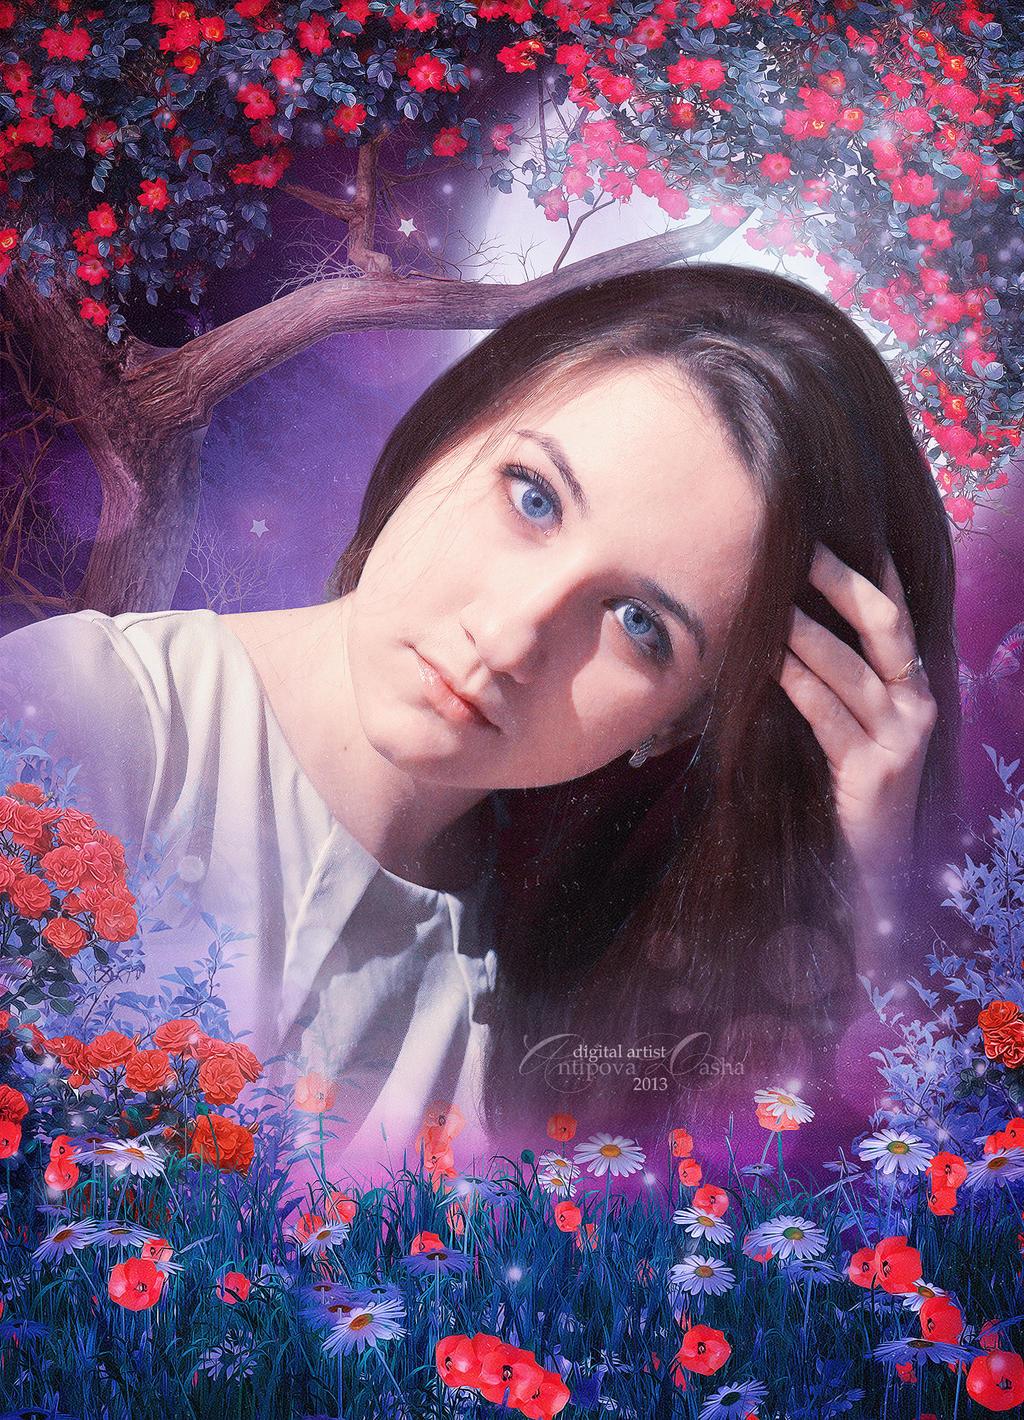 dashyla-pushyla's Profile Picture